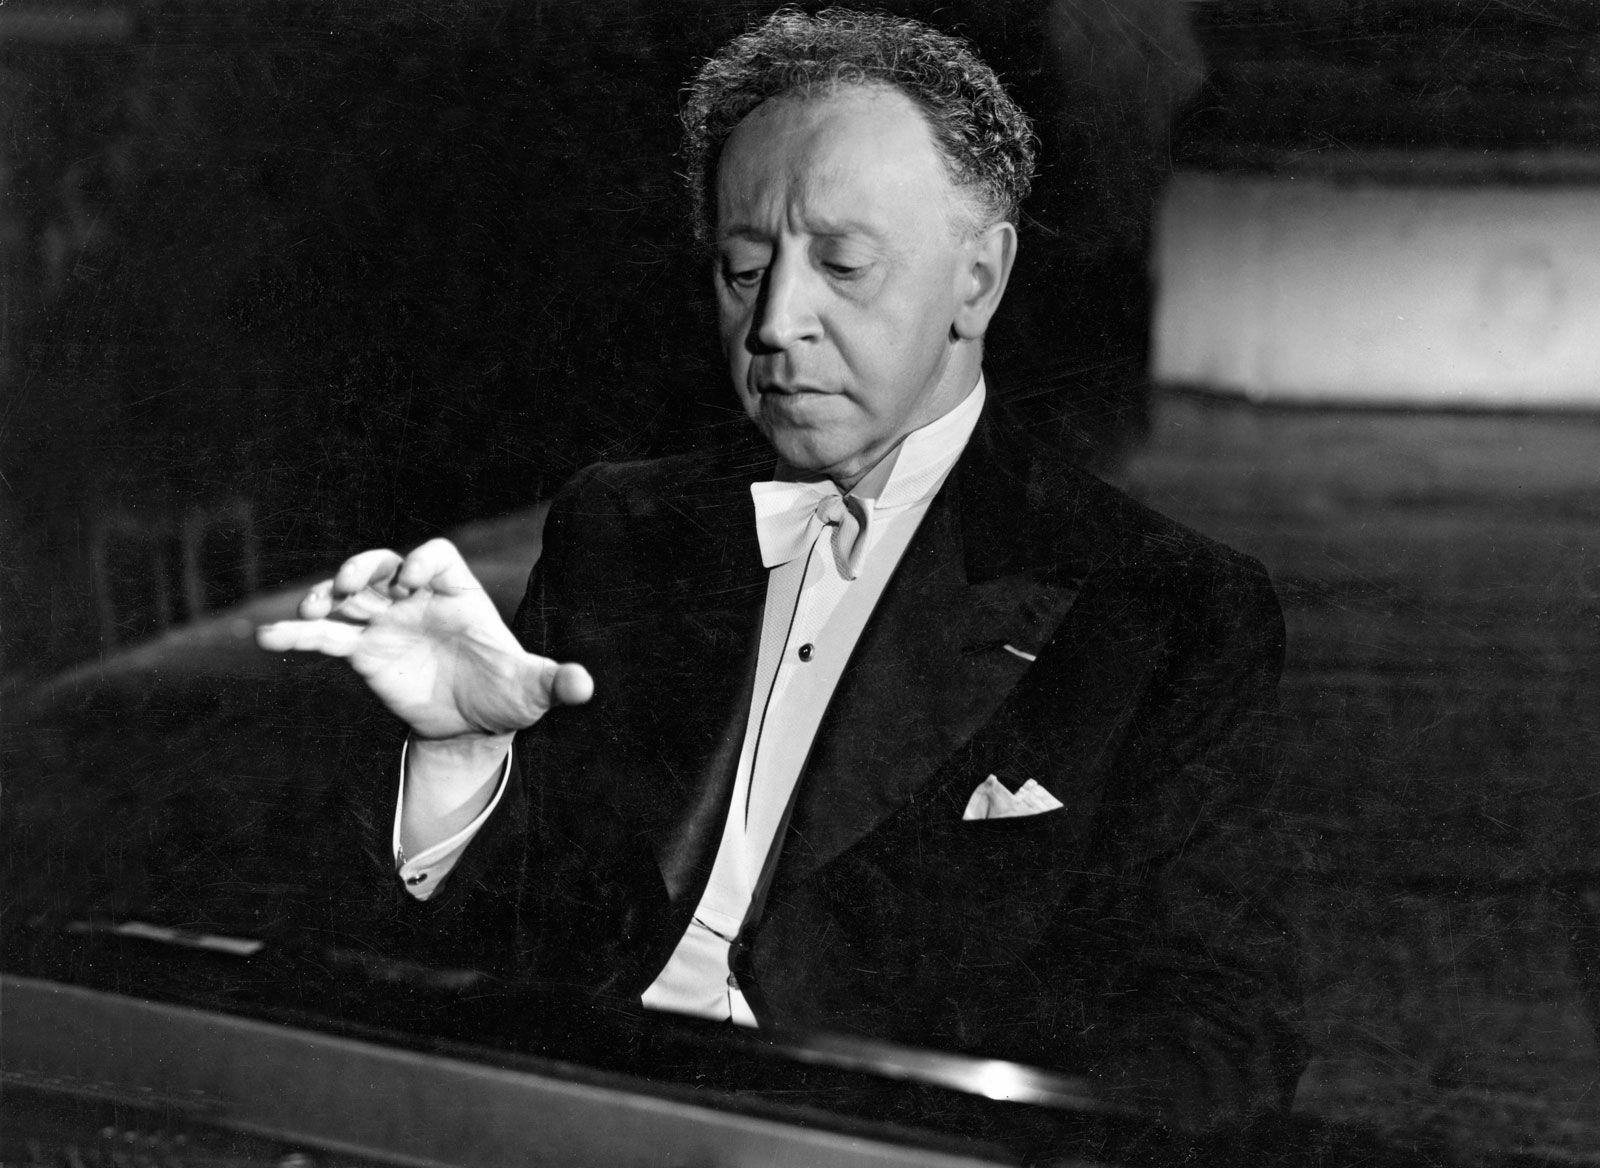 pianist Arthur Rubinstein, 1887-1982   Arthur rubinstein, Piano music,  Famous composers